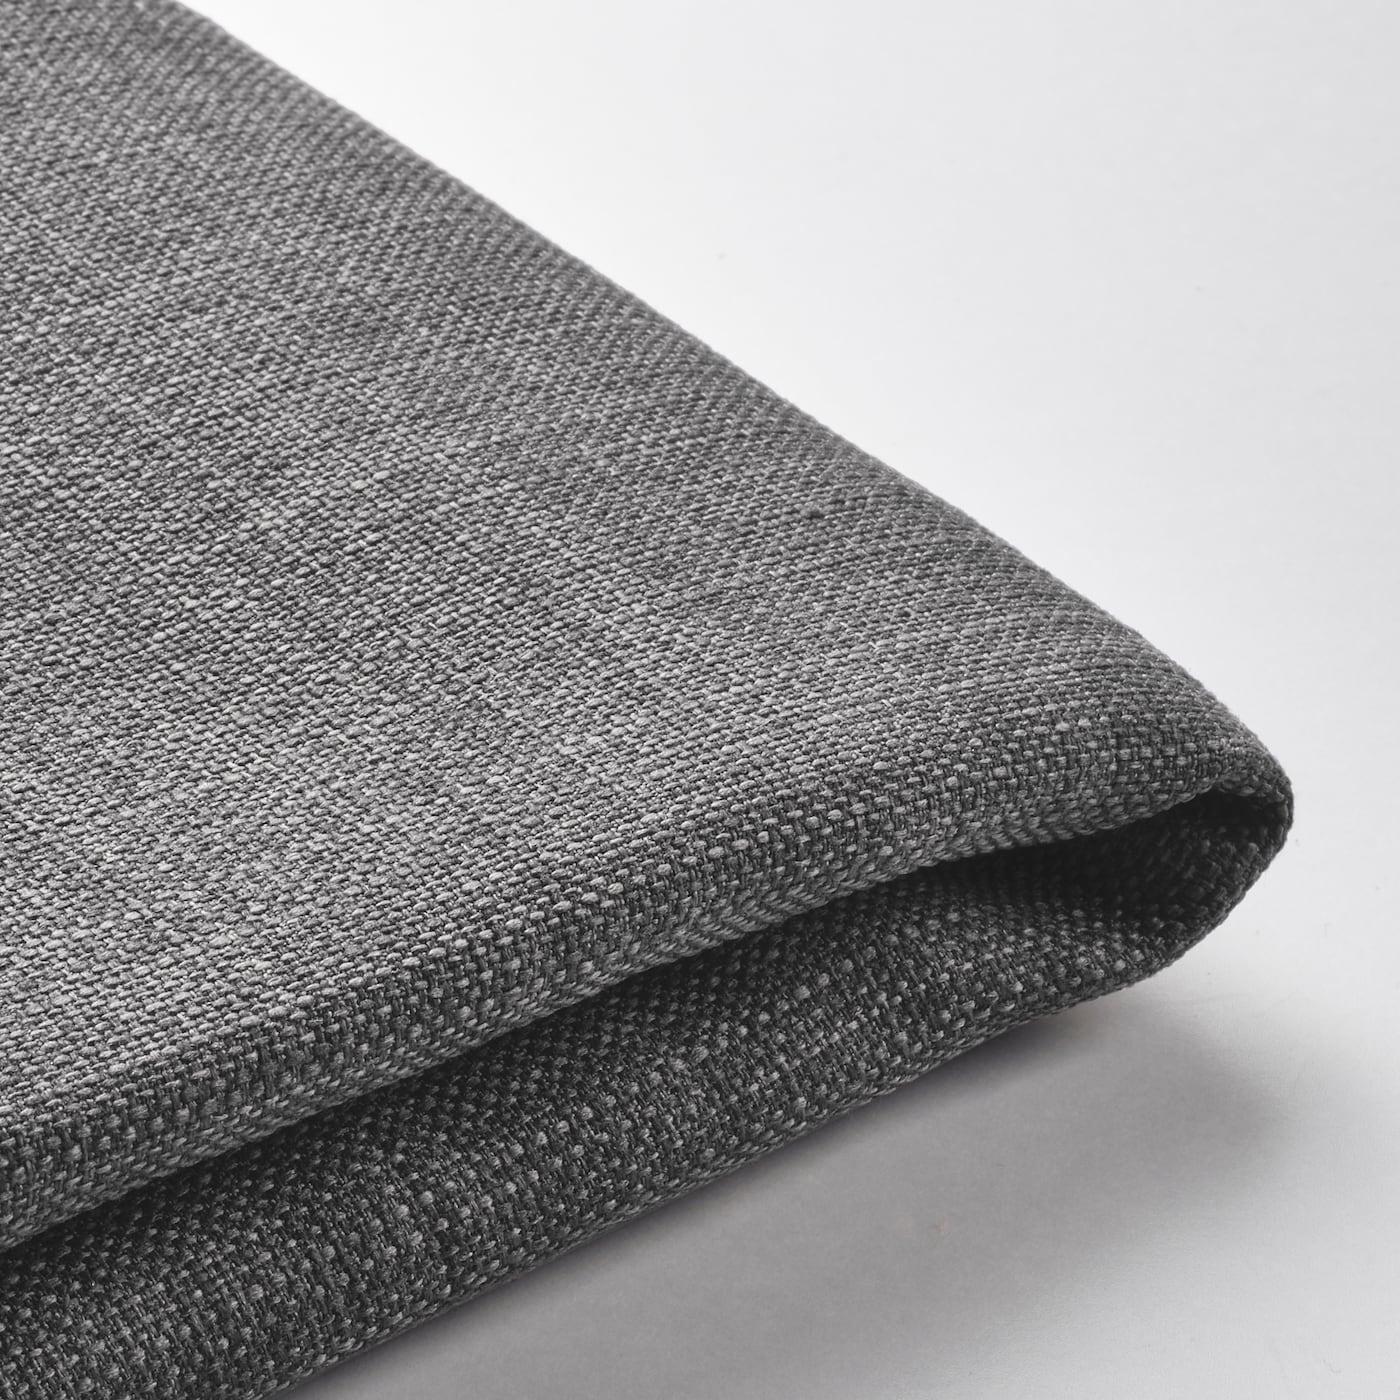 IKEA NILS Skiftebo gris foncé Tabouret Housse 902.932.92 NEUF dans emballage